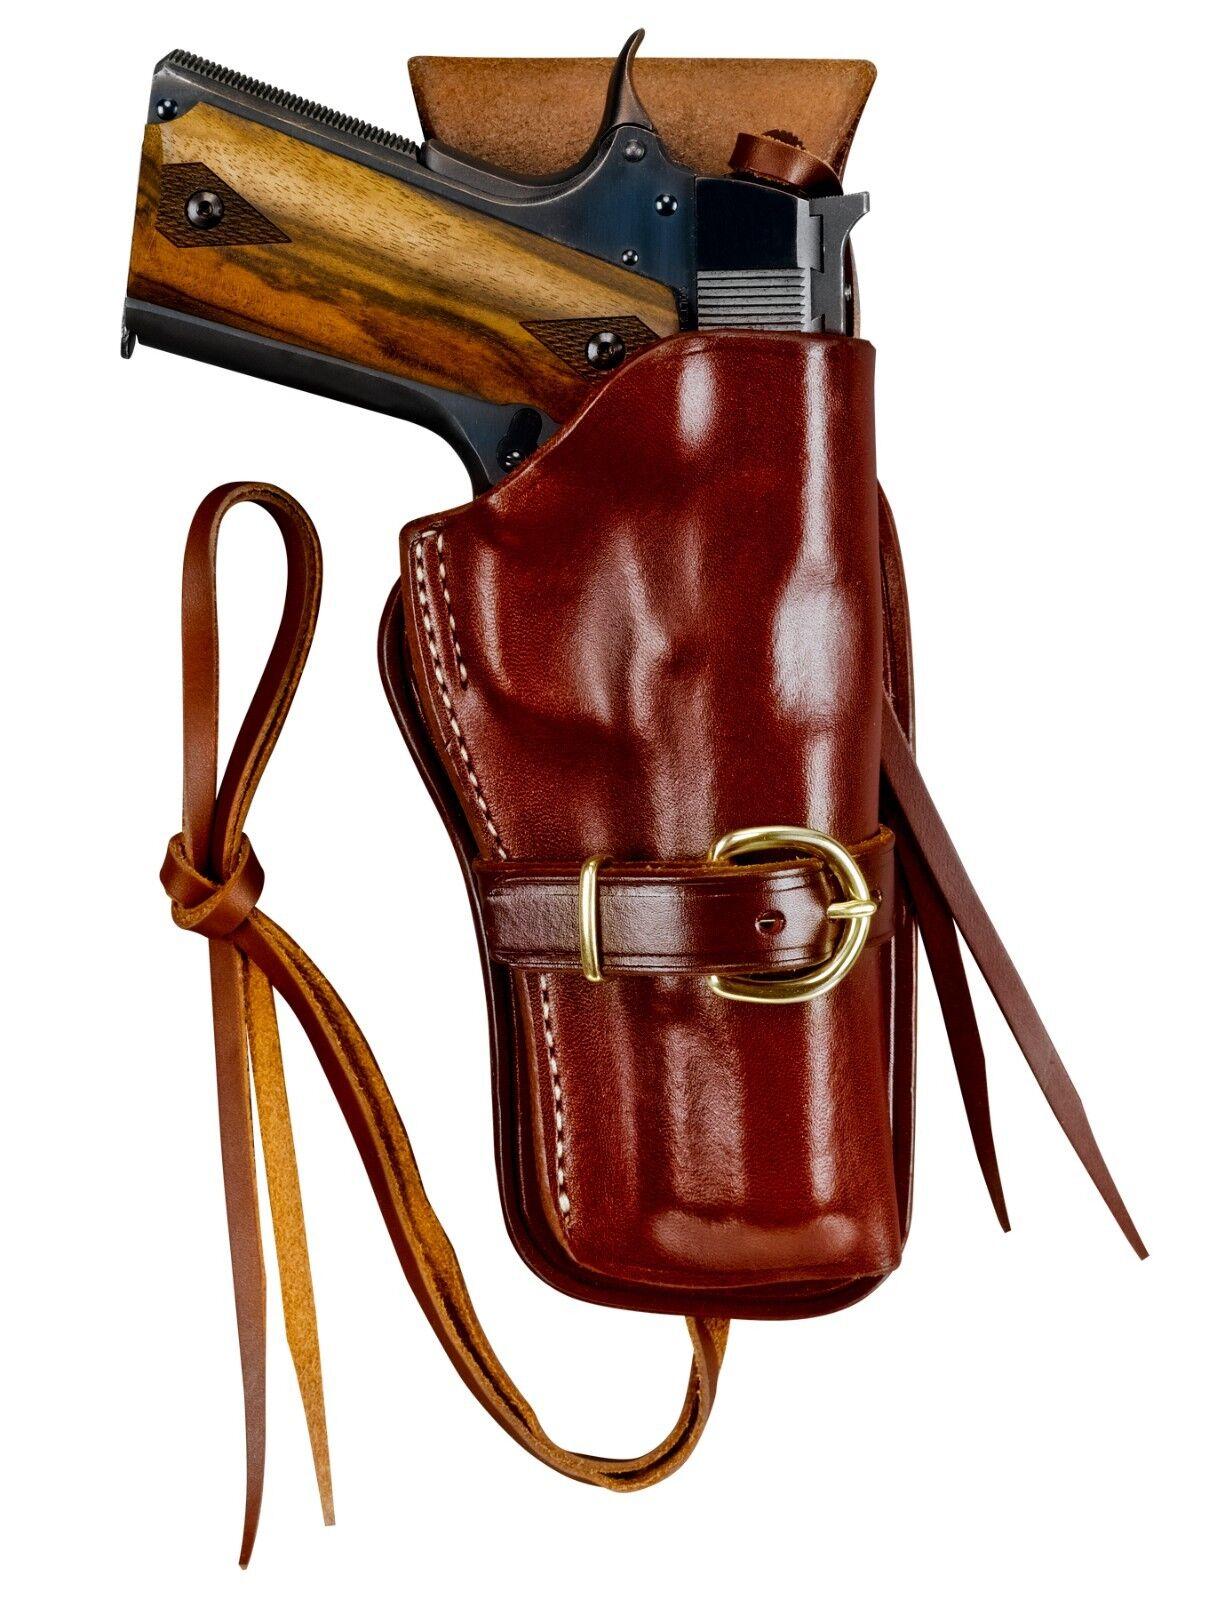 Triple K Cheyenne Western holster for Colt 1911 #1483